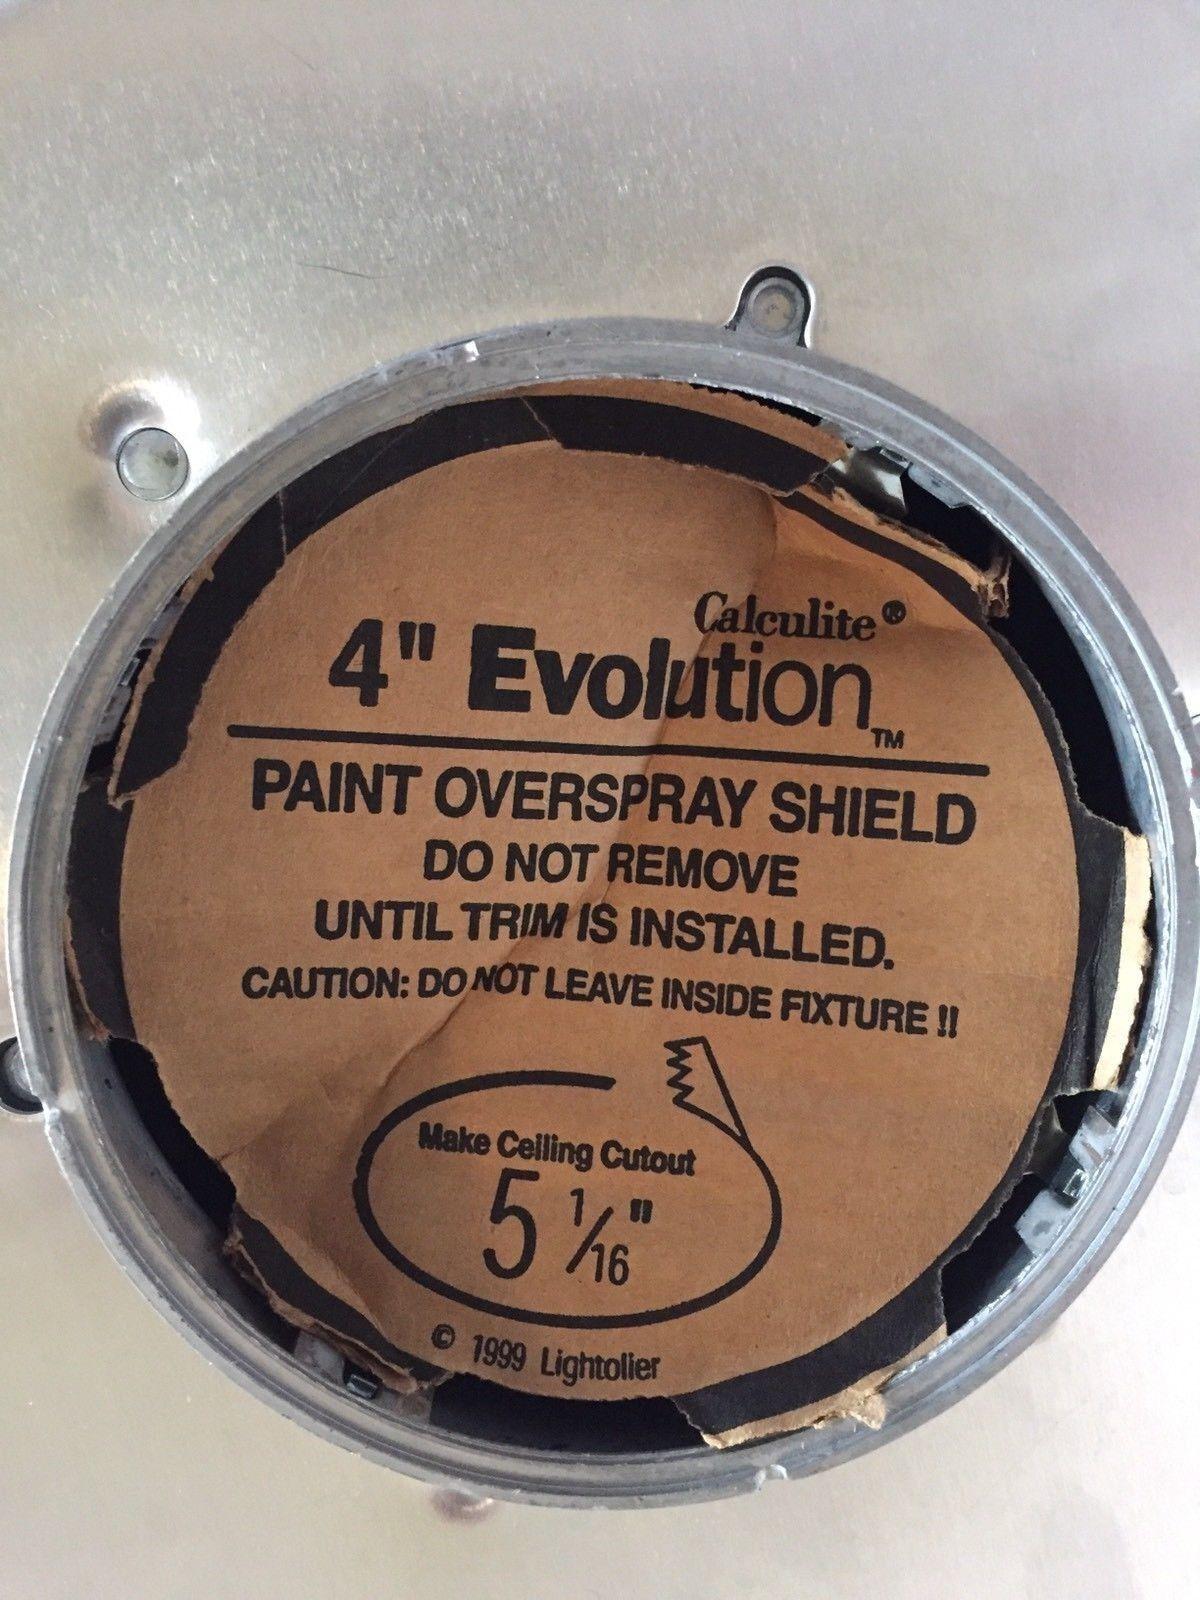 Phillips Lighttolier C4120 Calculite Evolution 4 1//2 inch Aperture Incandescent